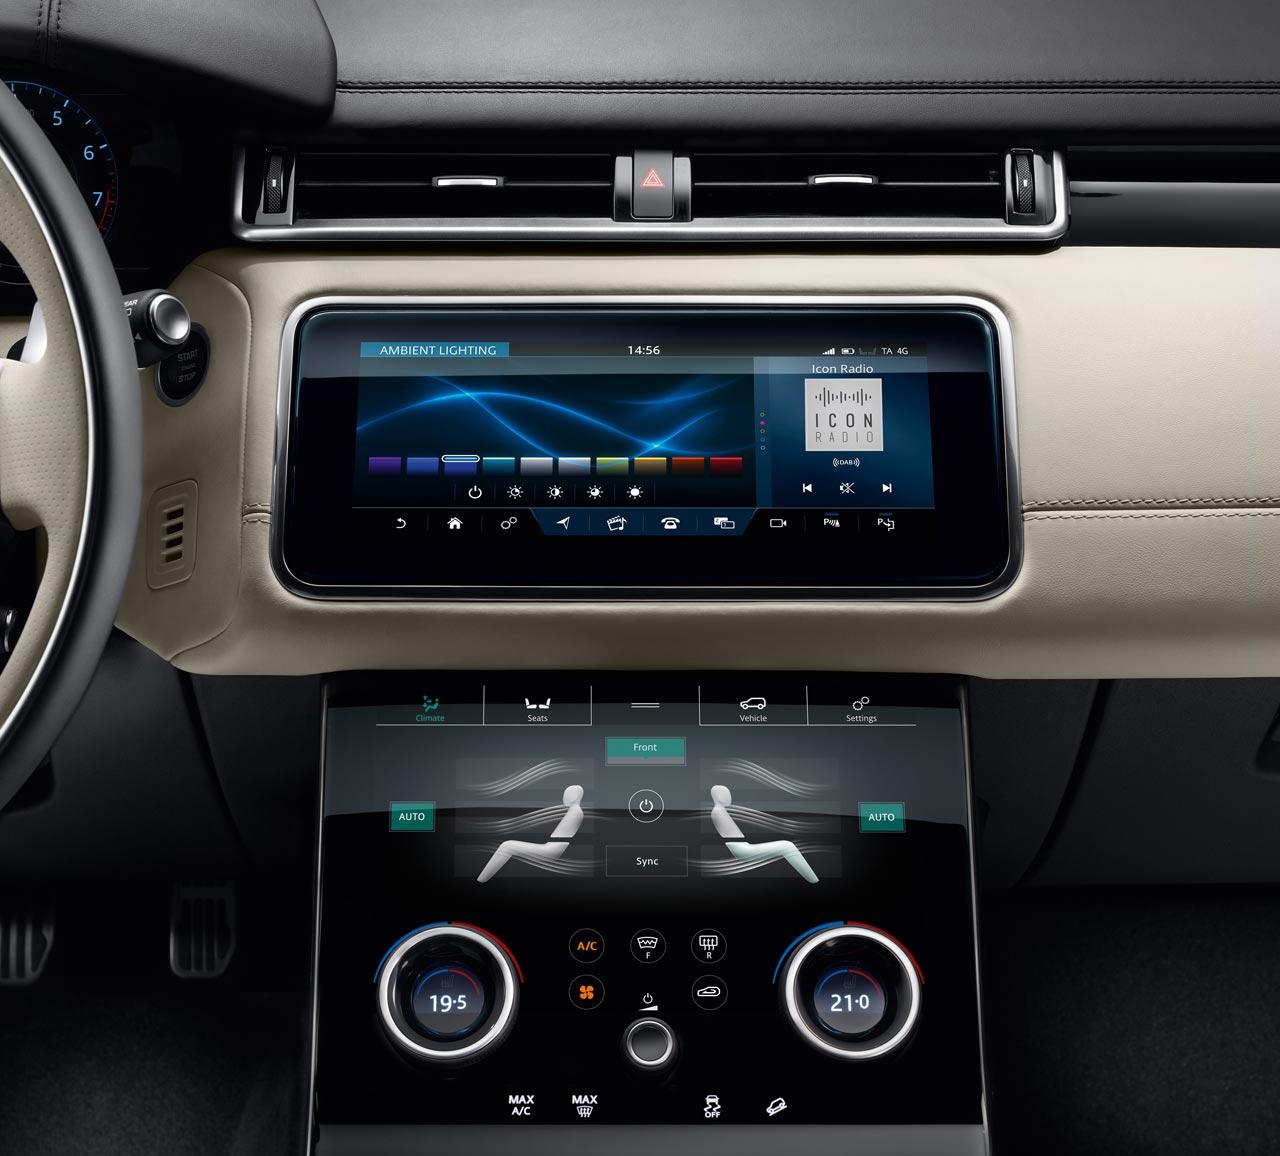 Consola Range Rover Velar